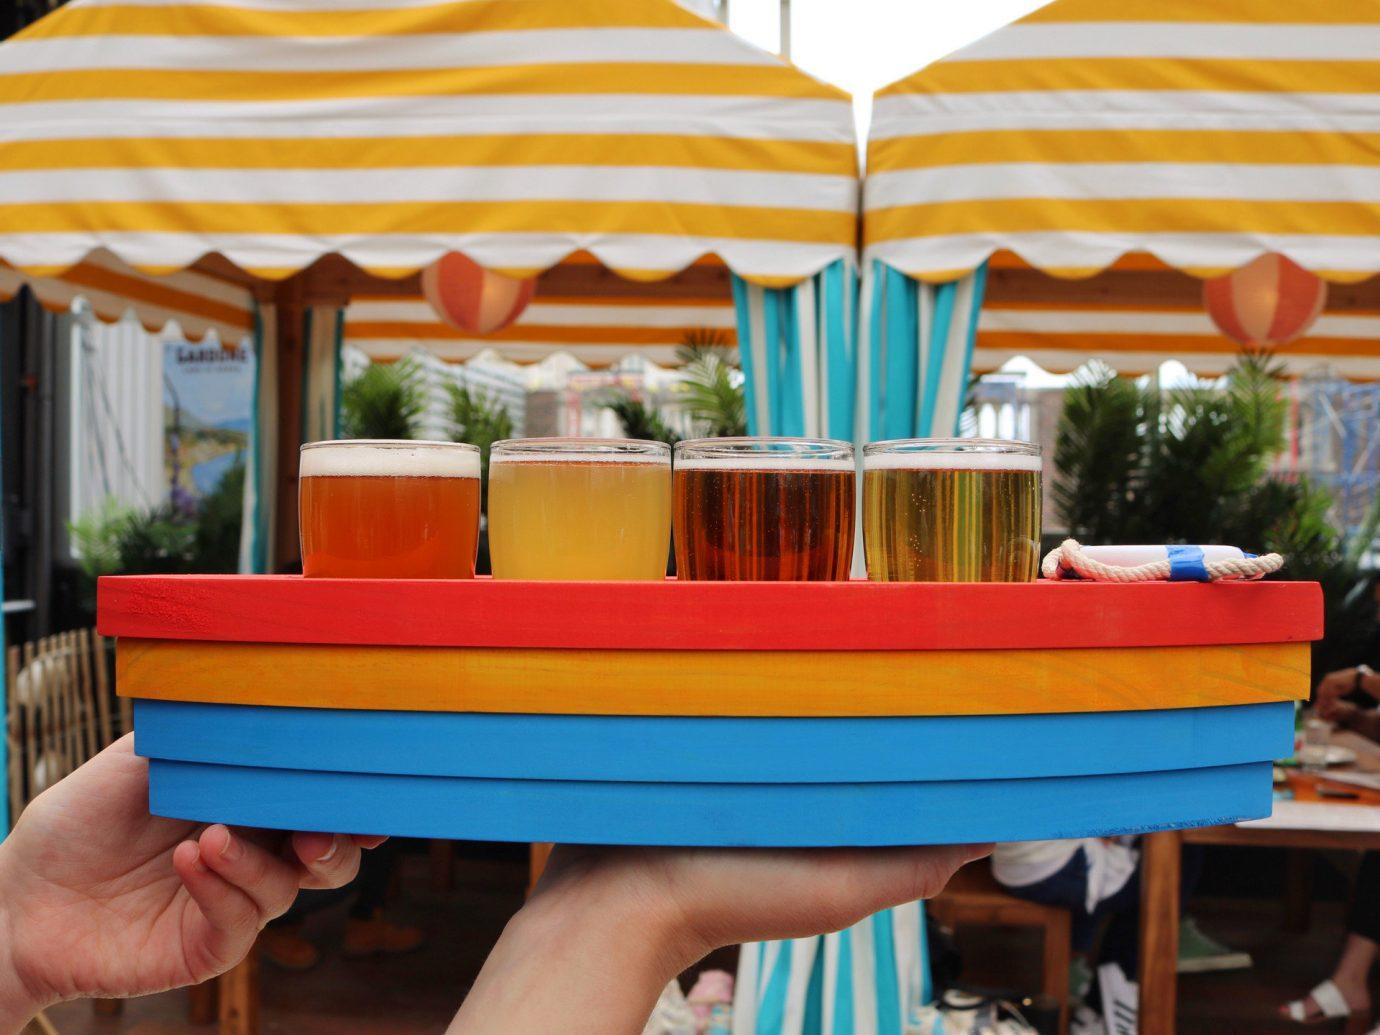 beer beer garden beer tasting Boat Drink flight Food + Drink Patio Terrace person leisure amusement park Play vacation colorful amusement ride Resort furniture blue